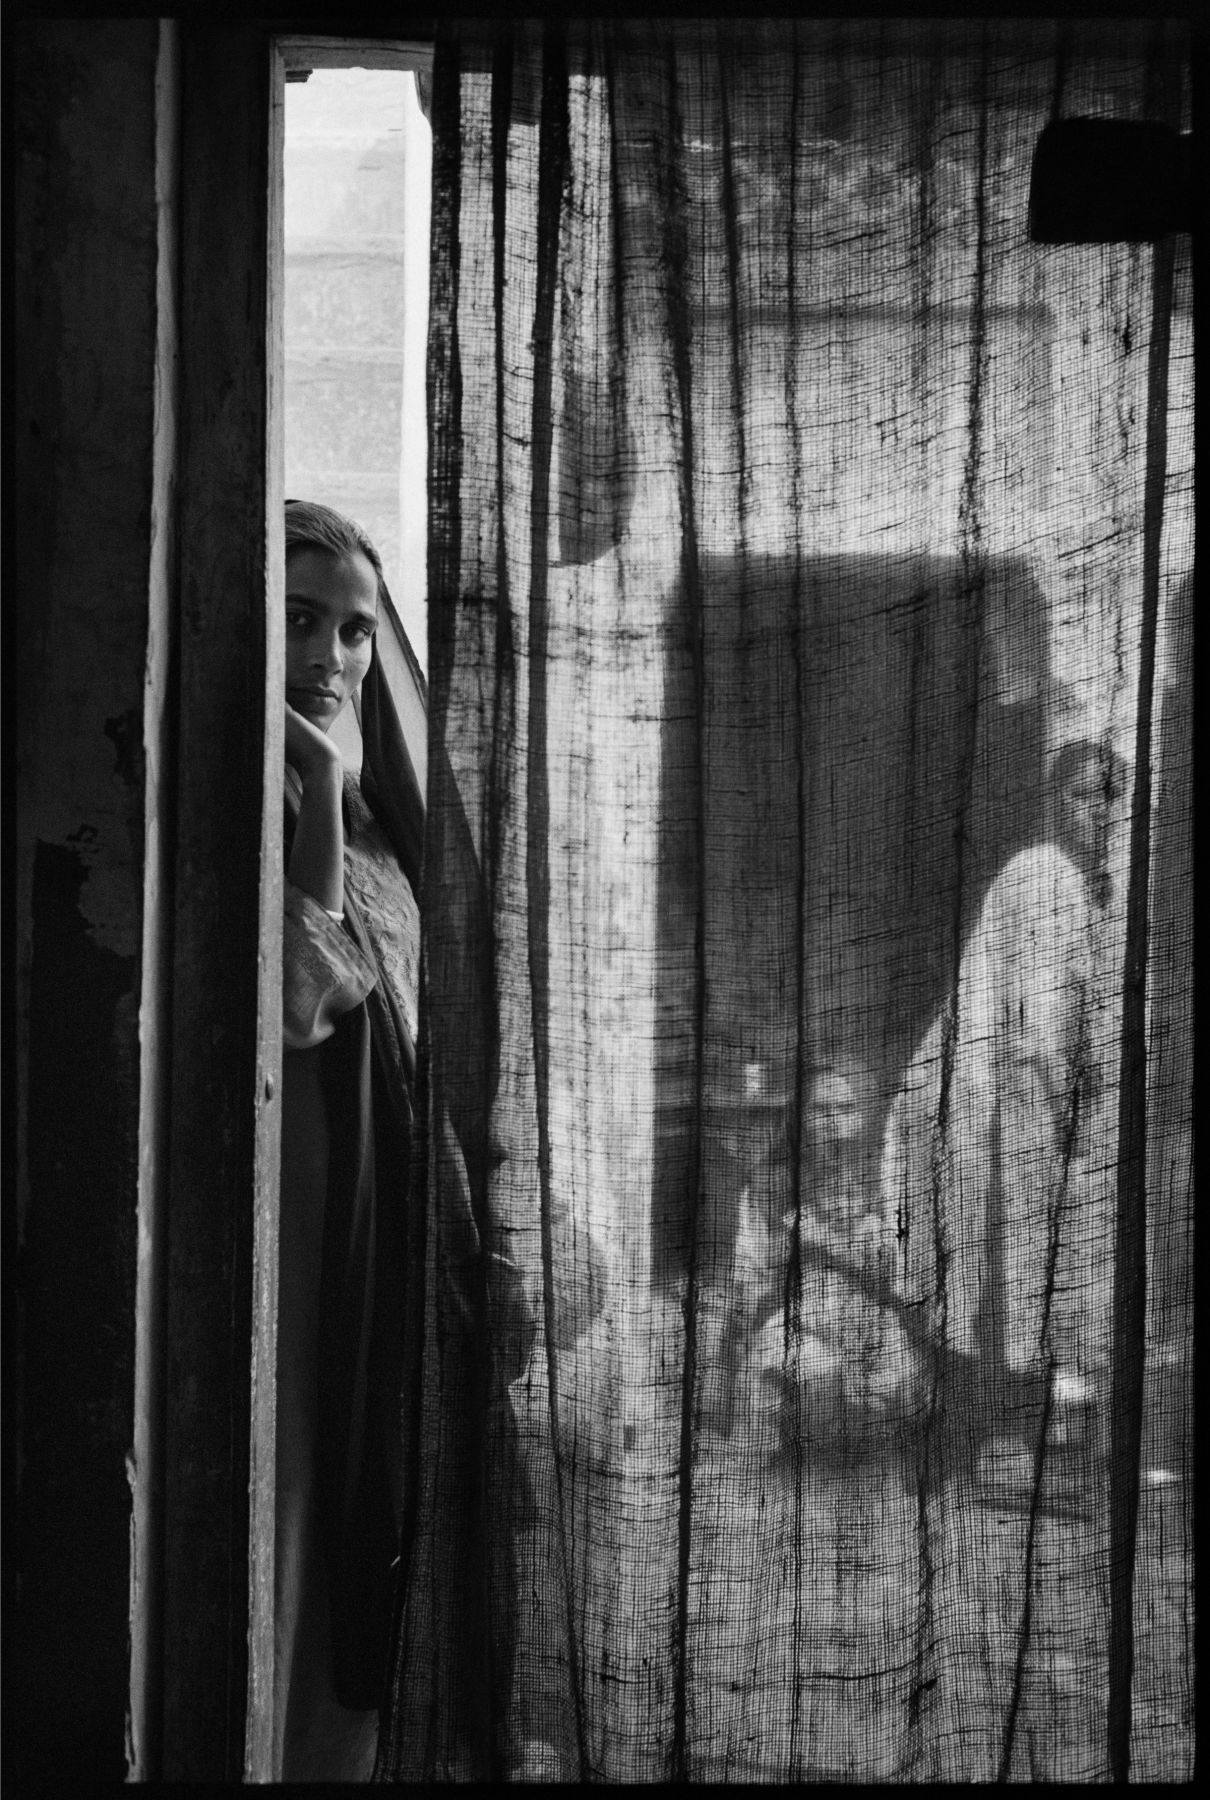 Untitled, Fatehpur, India 2003.